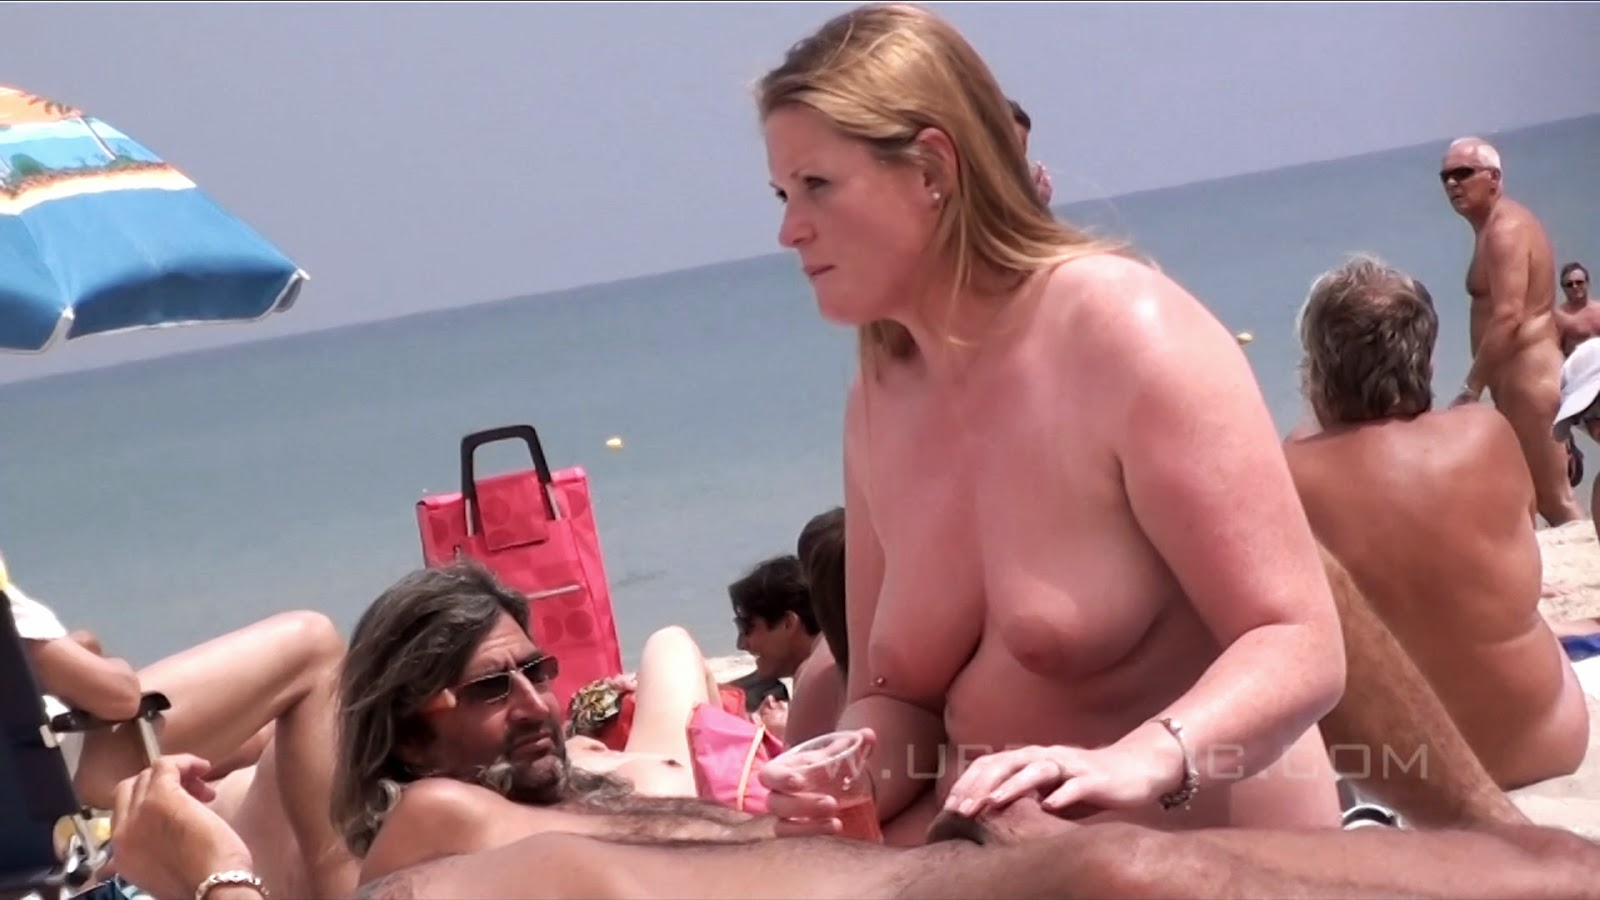 Blogspot fishnew nudism family nudism eu young